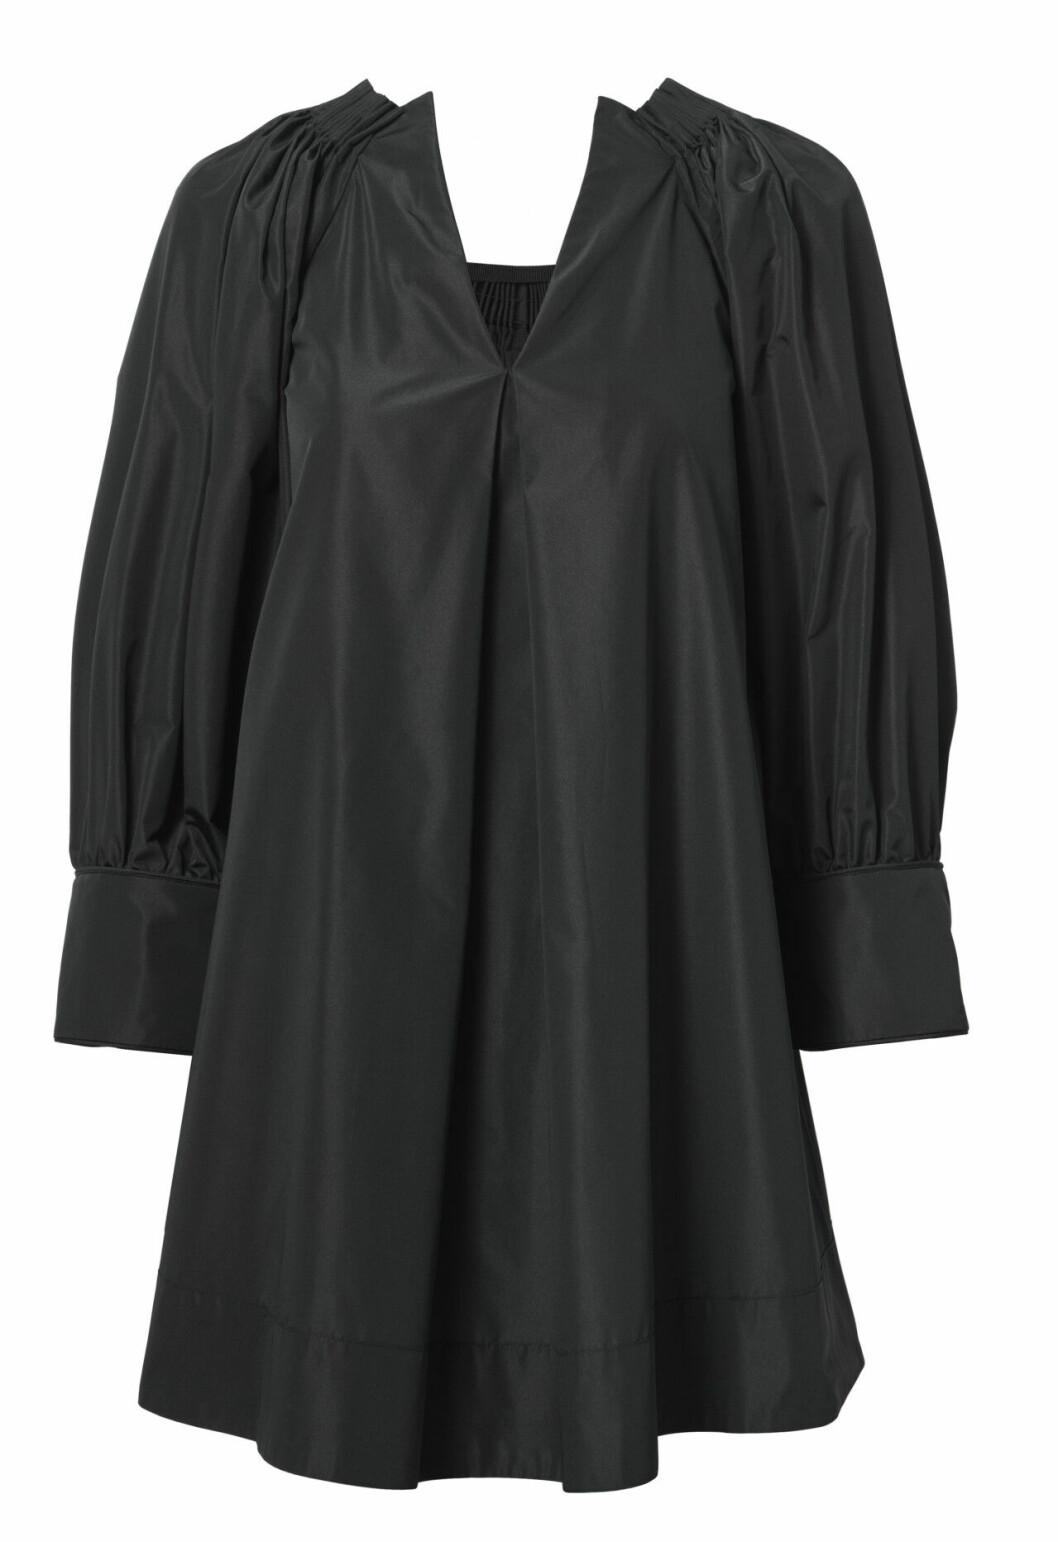 H&M conscious exclusive SS20 – svart tunika